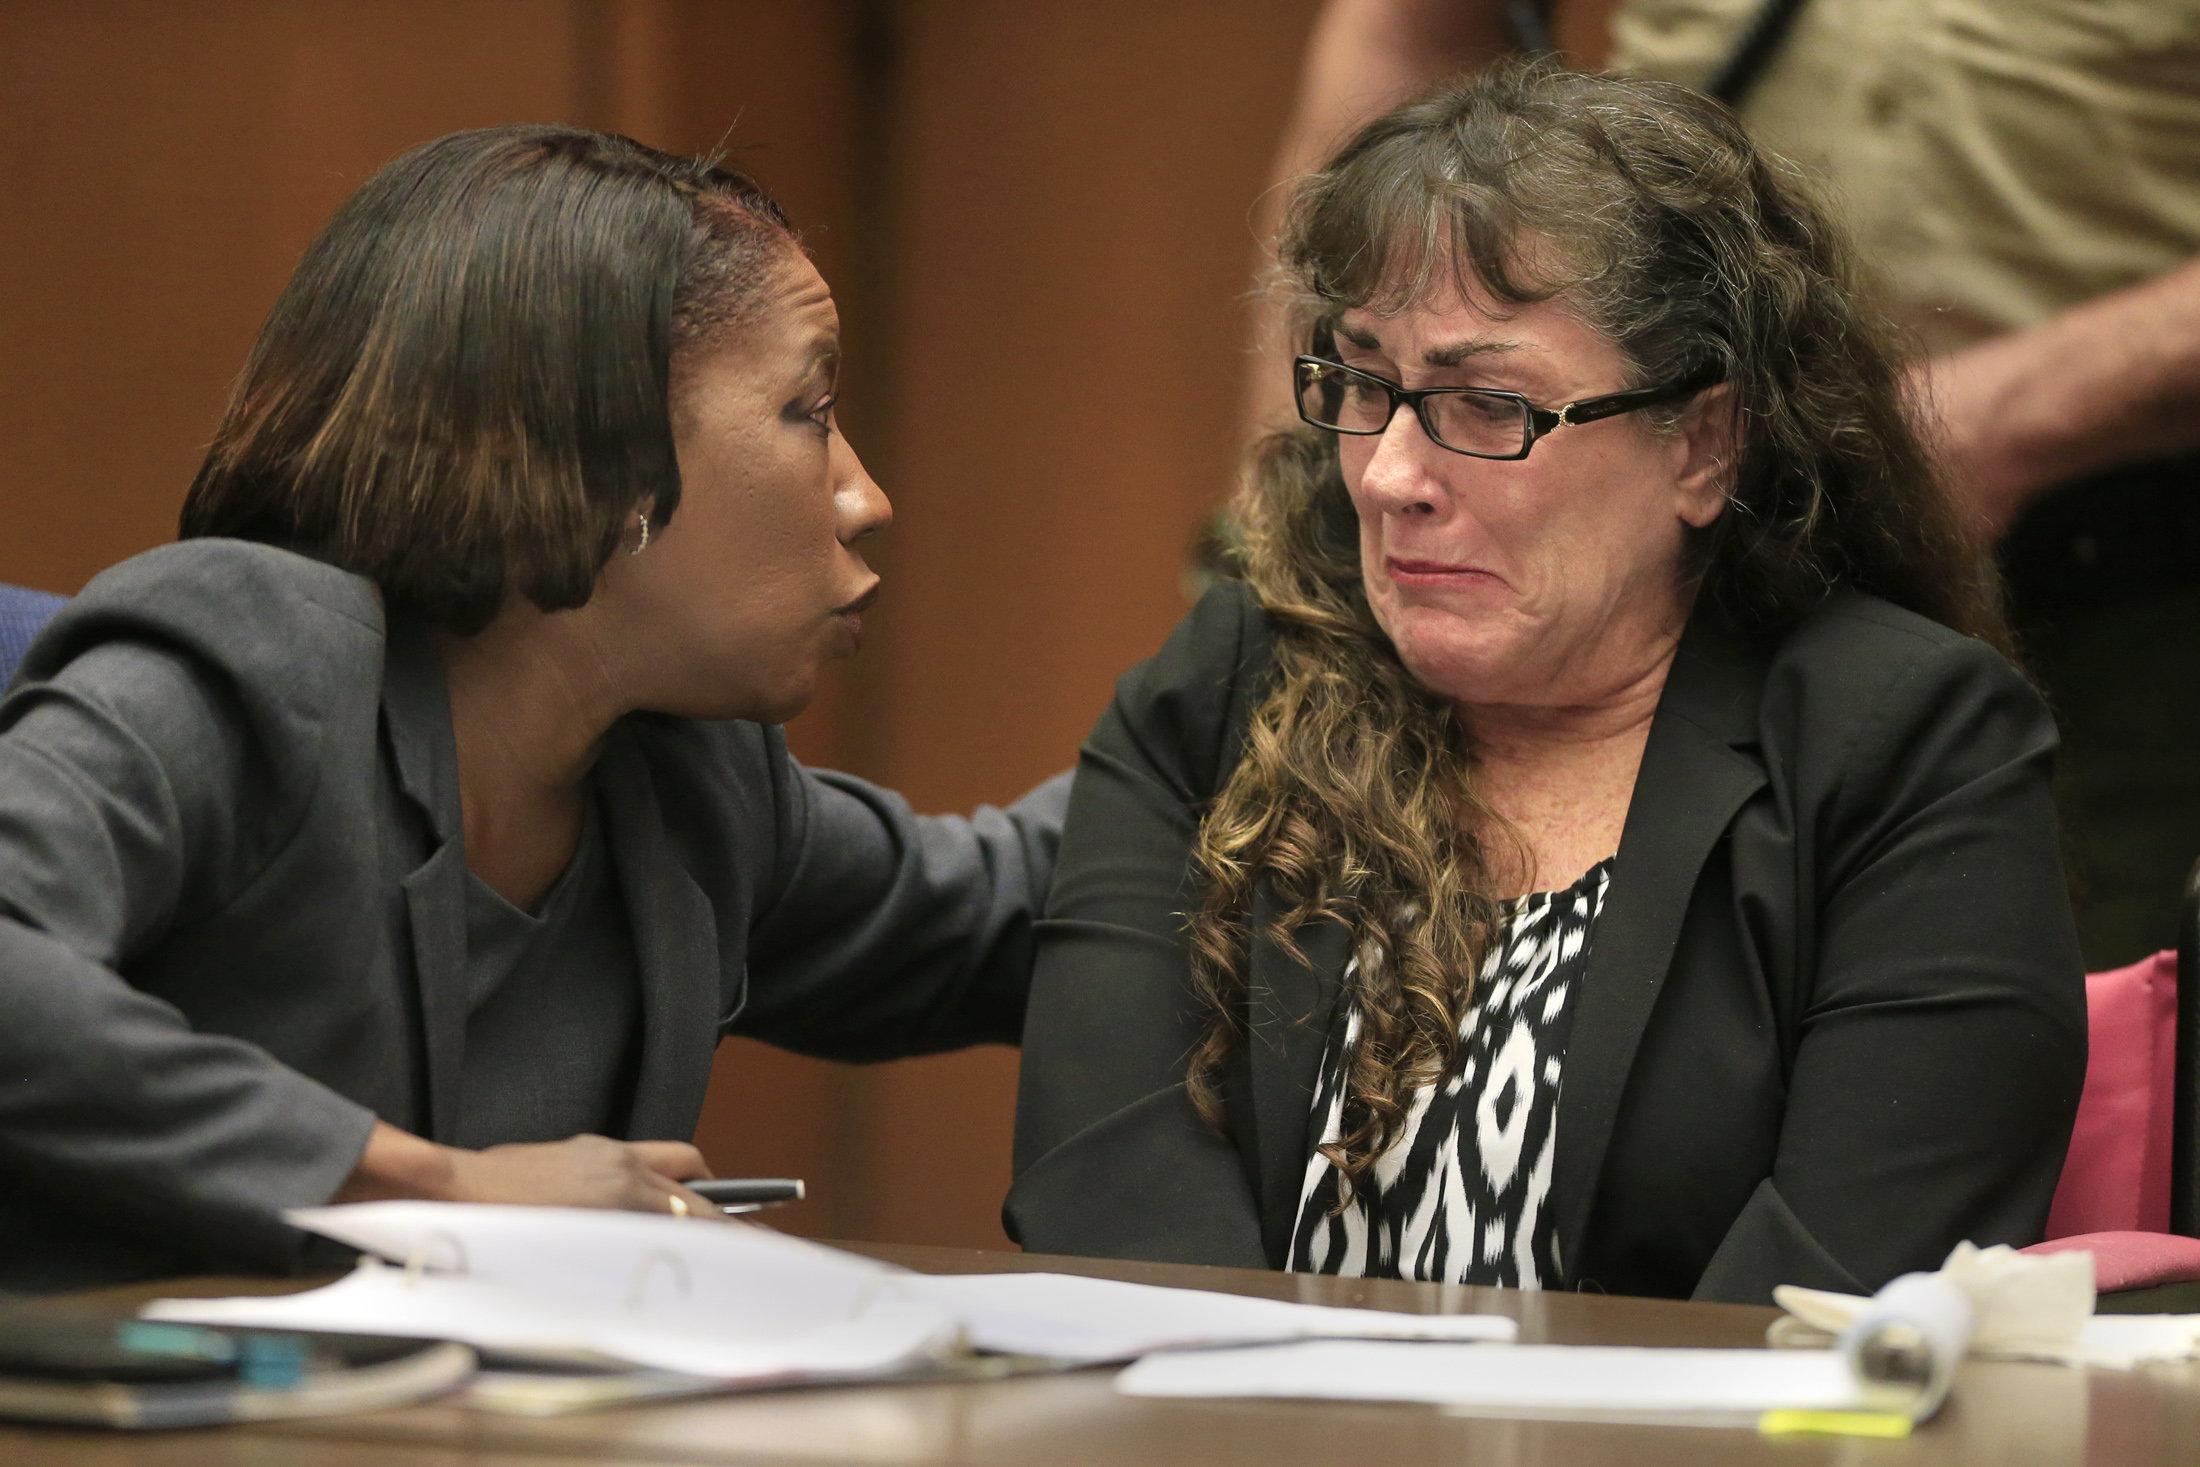 Public defender Nan Whitfield comforts substance-abuse counselorSherri Lynn Wilkins in 2014.